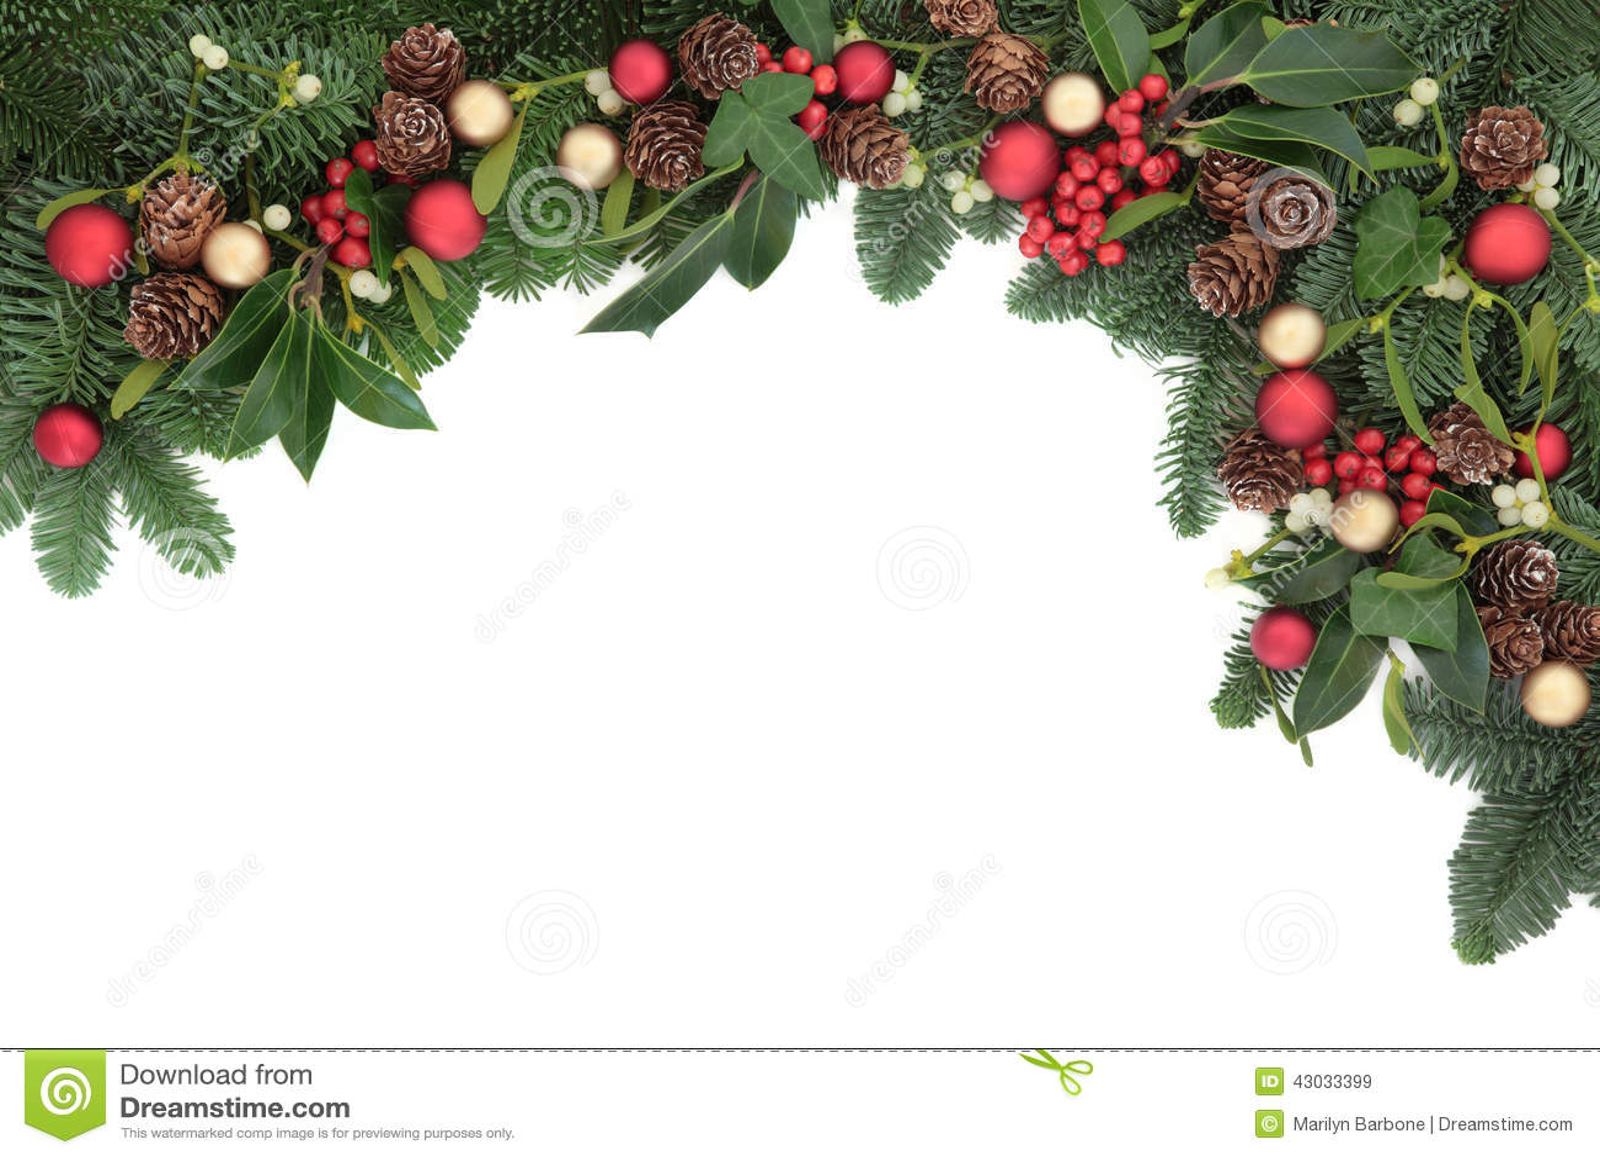 Christmas Seasonal Border Of Holly, Mistletoe, Royalty Free Stock ...